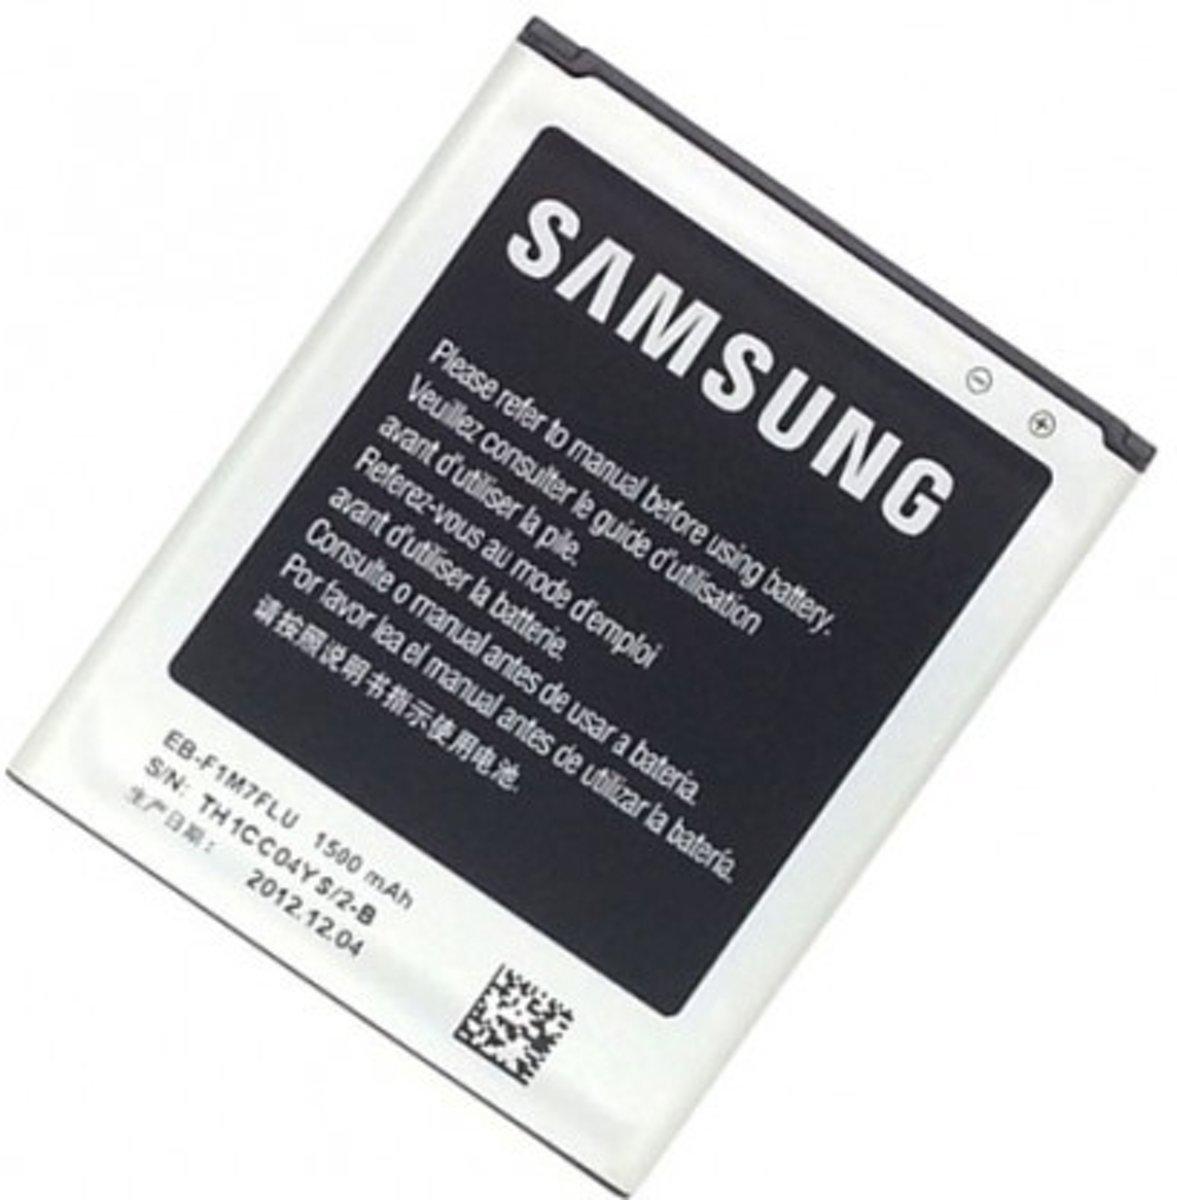 Samsung Accu EBF1M7FLU voor Samsung Galaxy S3 Mini i8190 - Origineel kopen